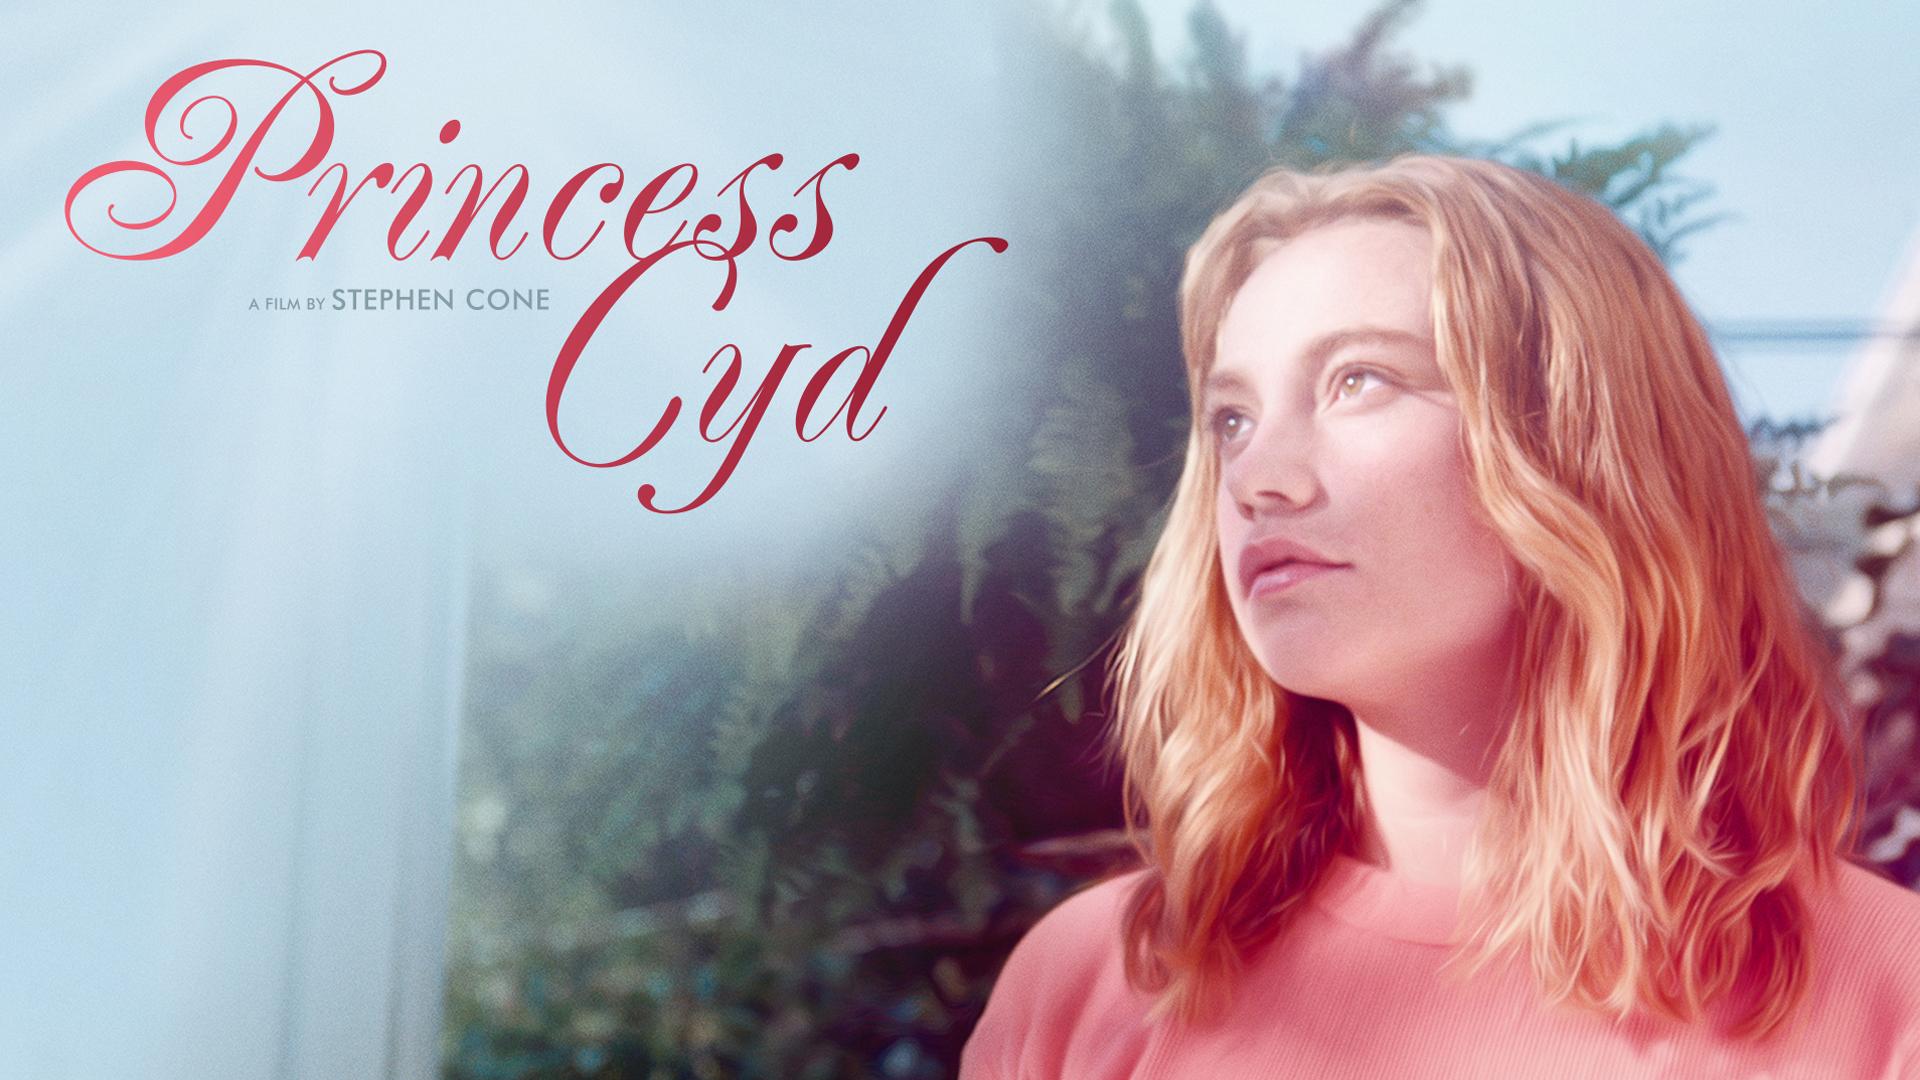 Princess Cyd